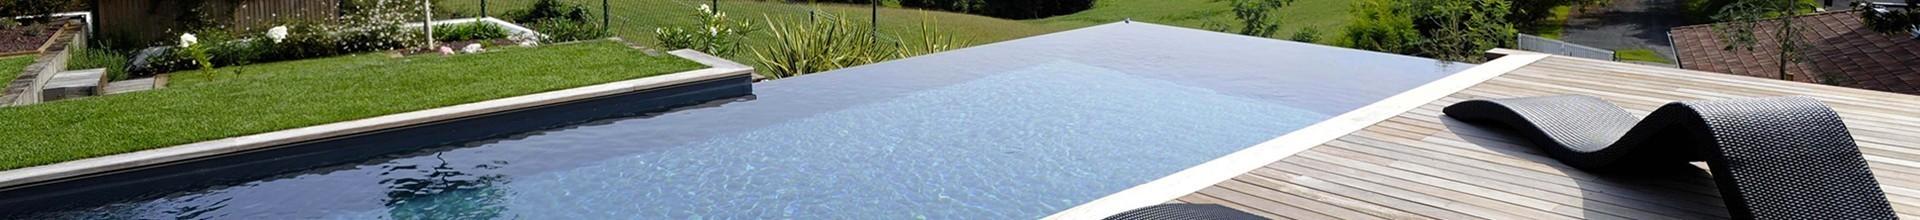 Direct usine, piscine coque prix Mayenne